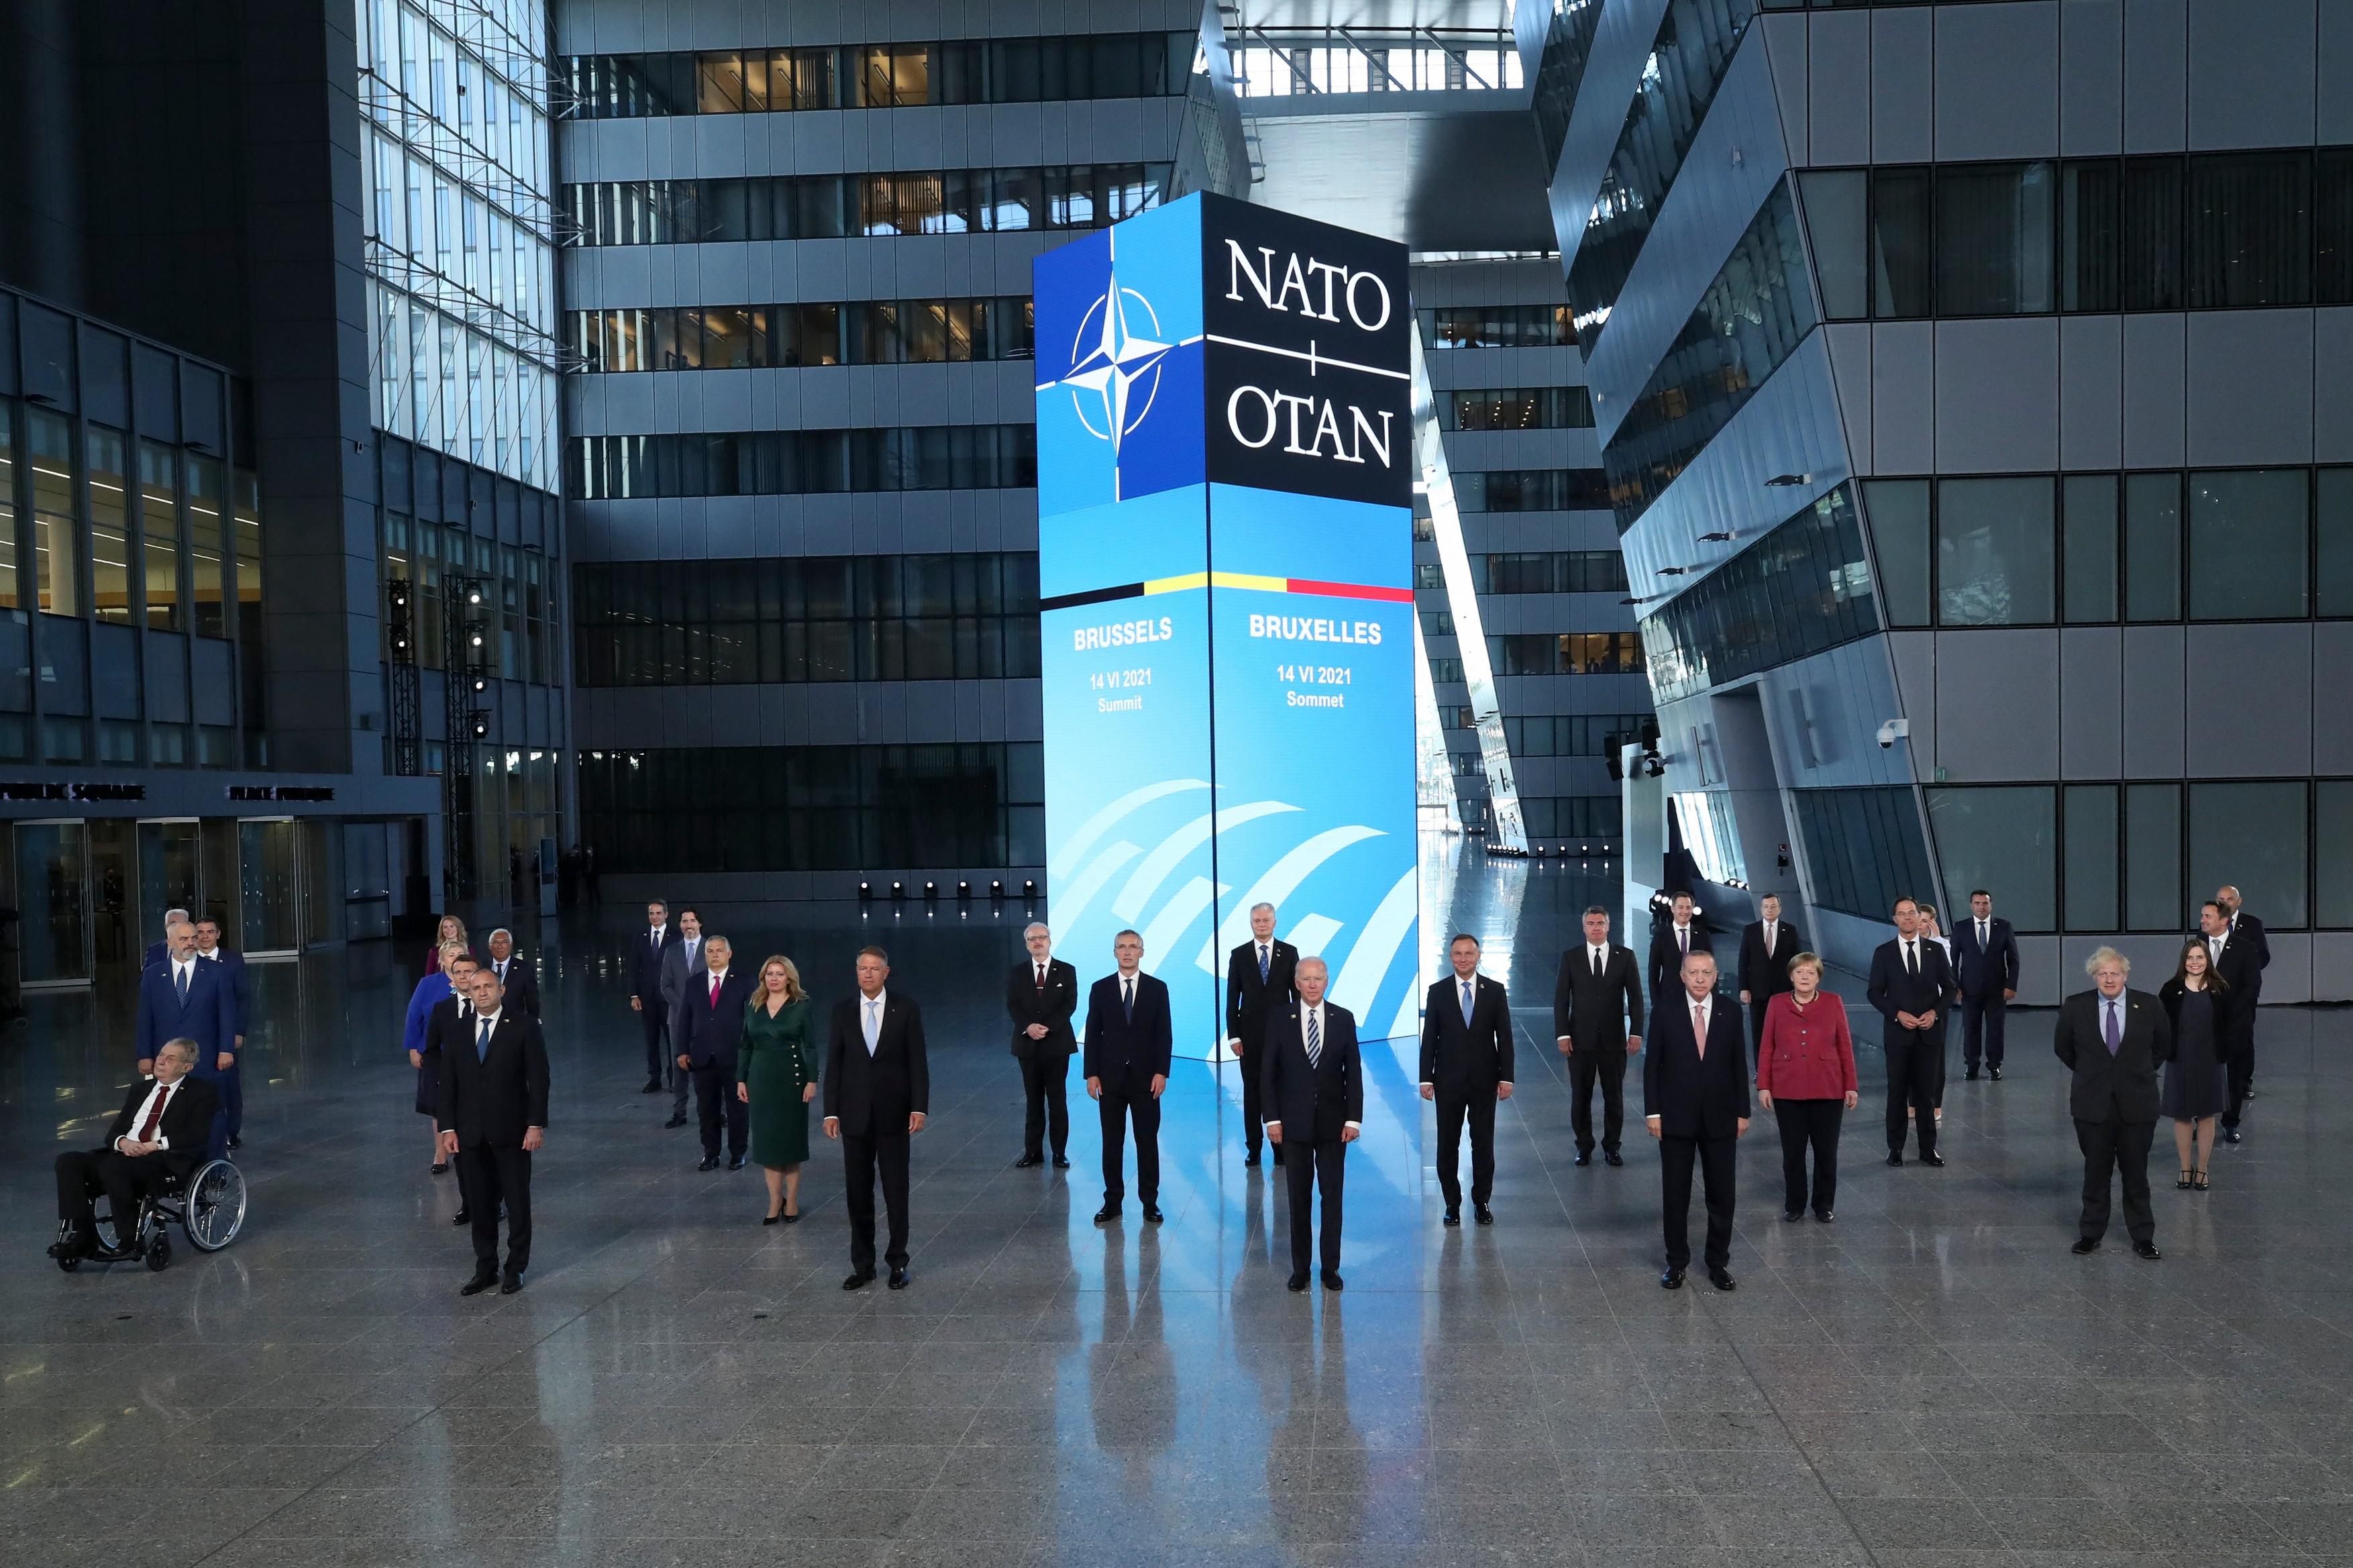 China si Rusia, principalele ingrijorari ale liderilor NATO: SUA si Europa trebuie sa ramana unite in fata regimurilor autoritare